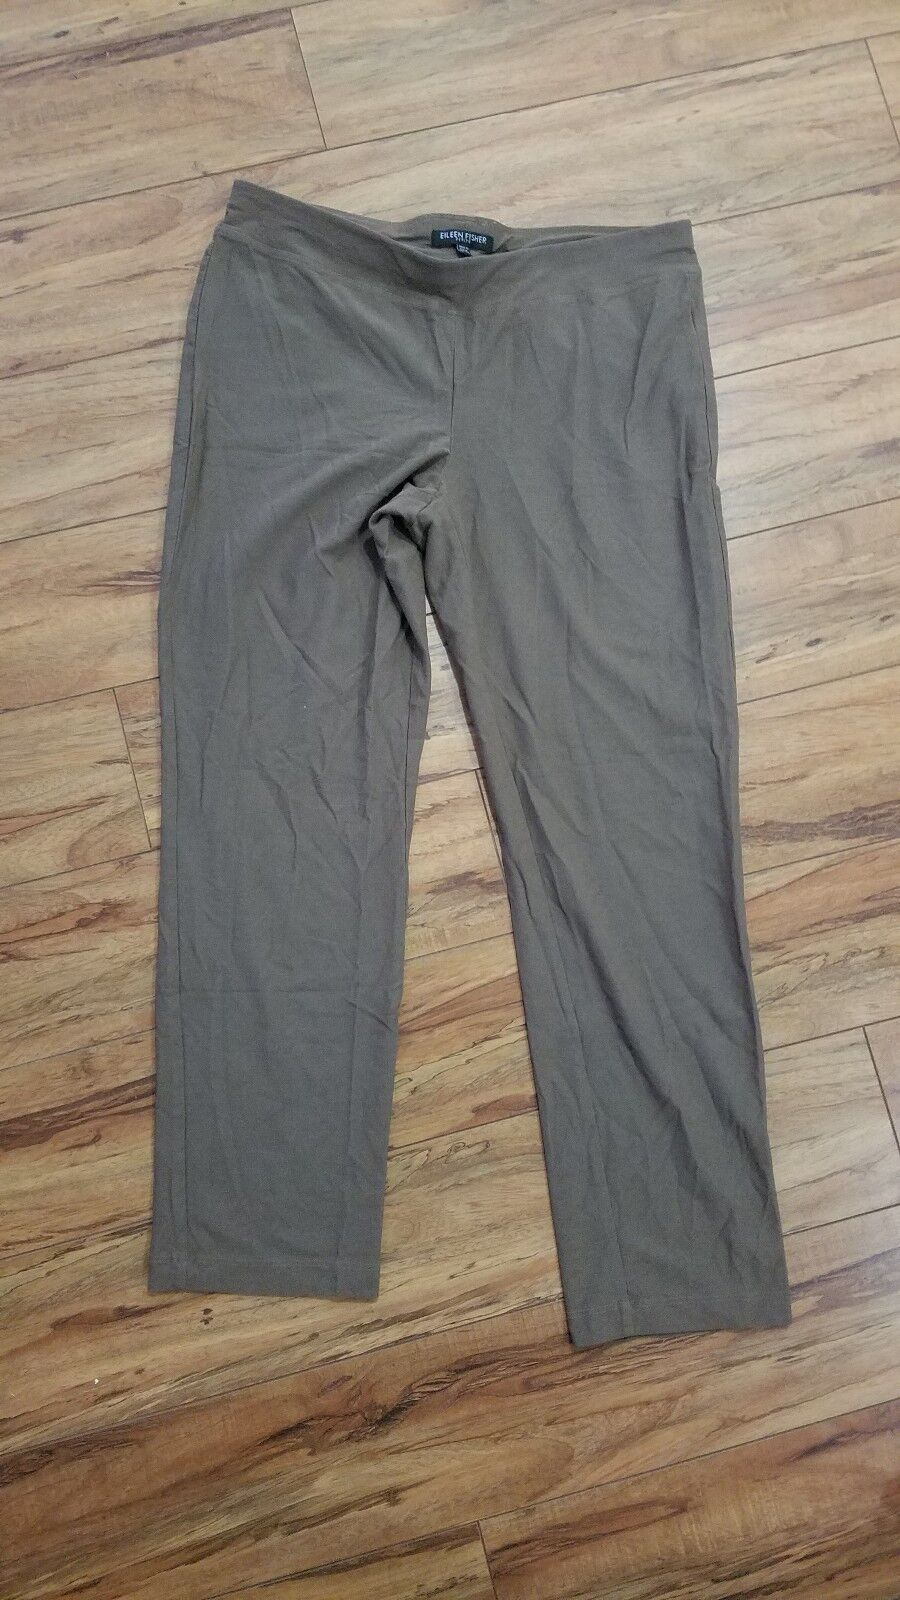 Eileen fisher petite golden brown 90% organic cotton 10% lycra pants size ps